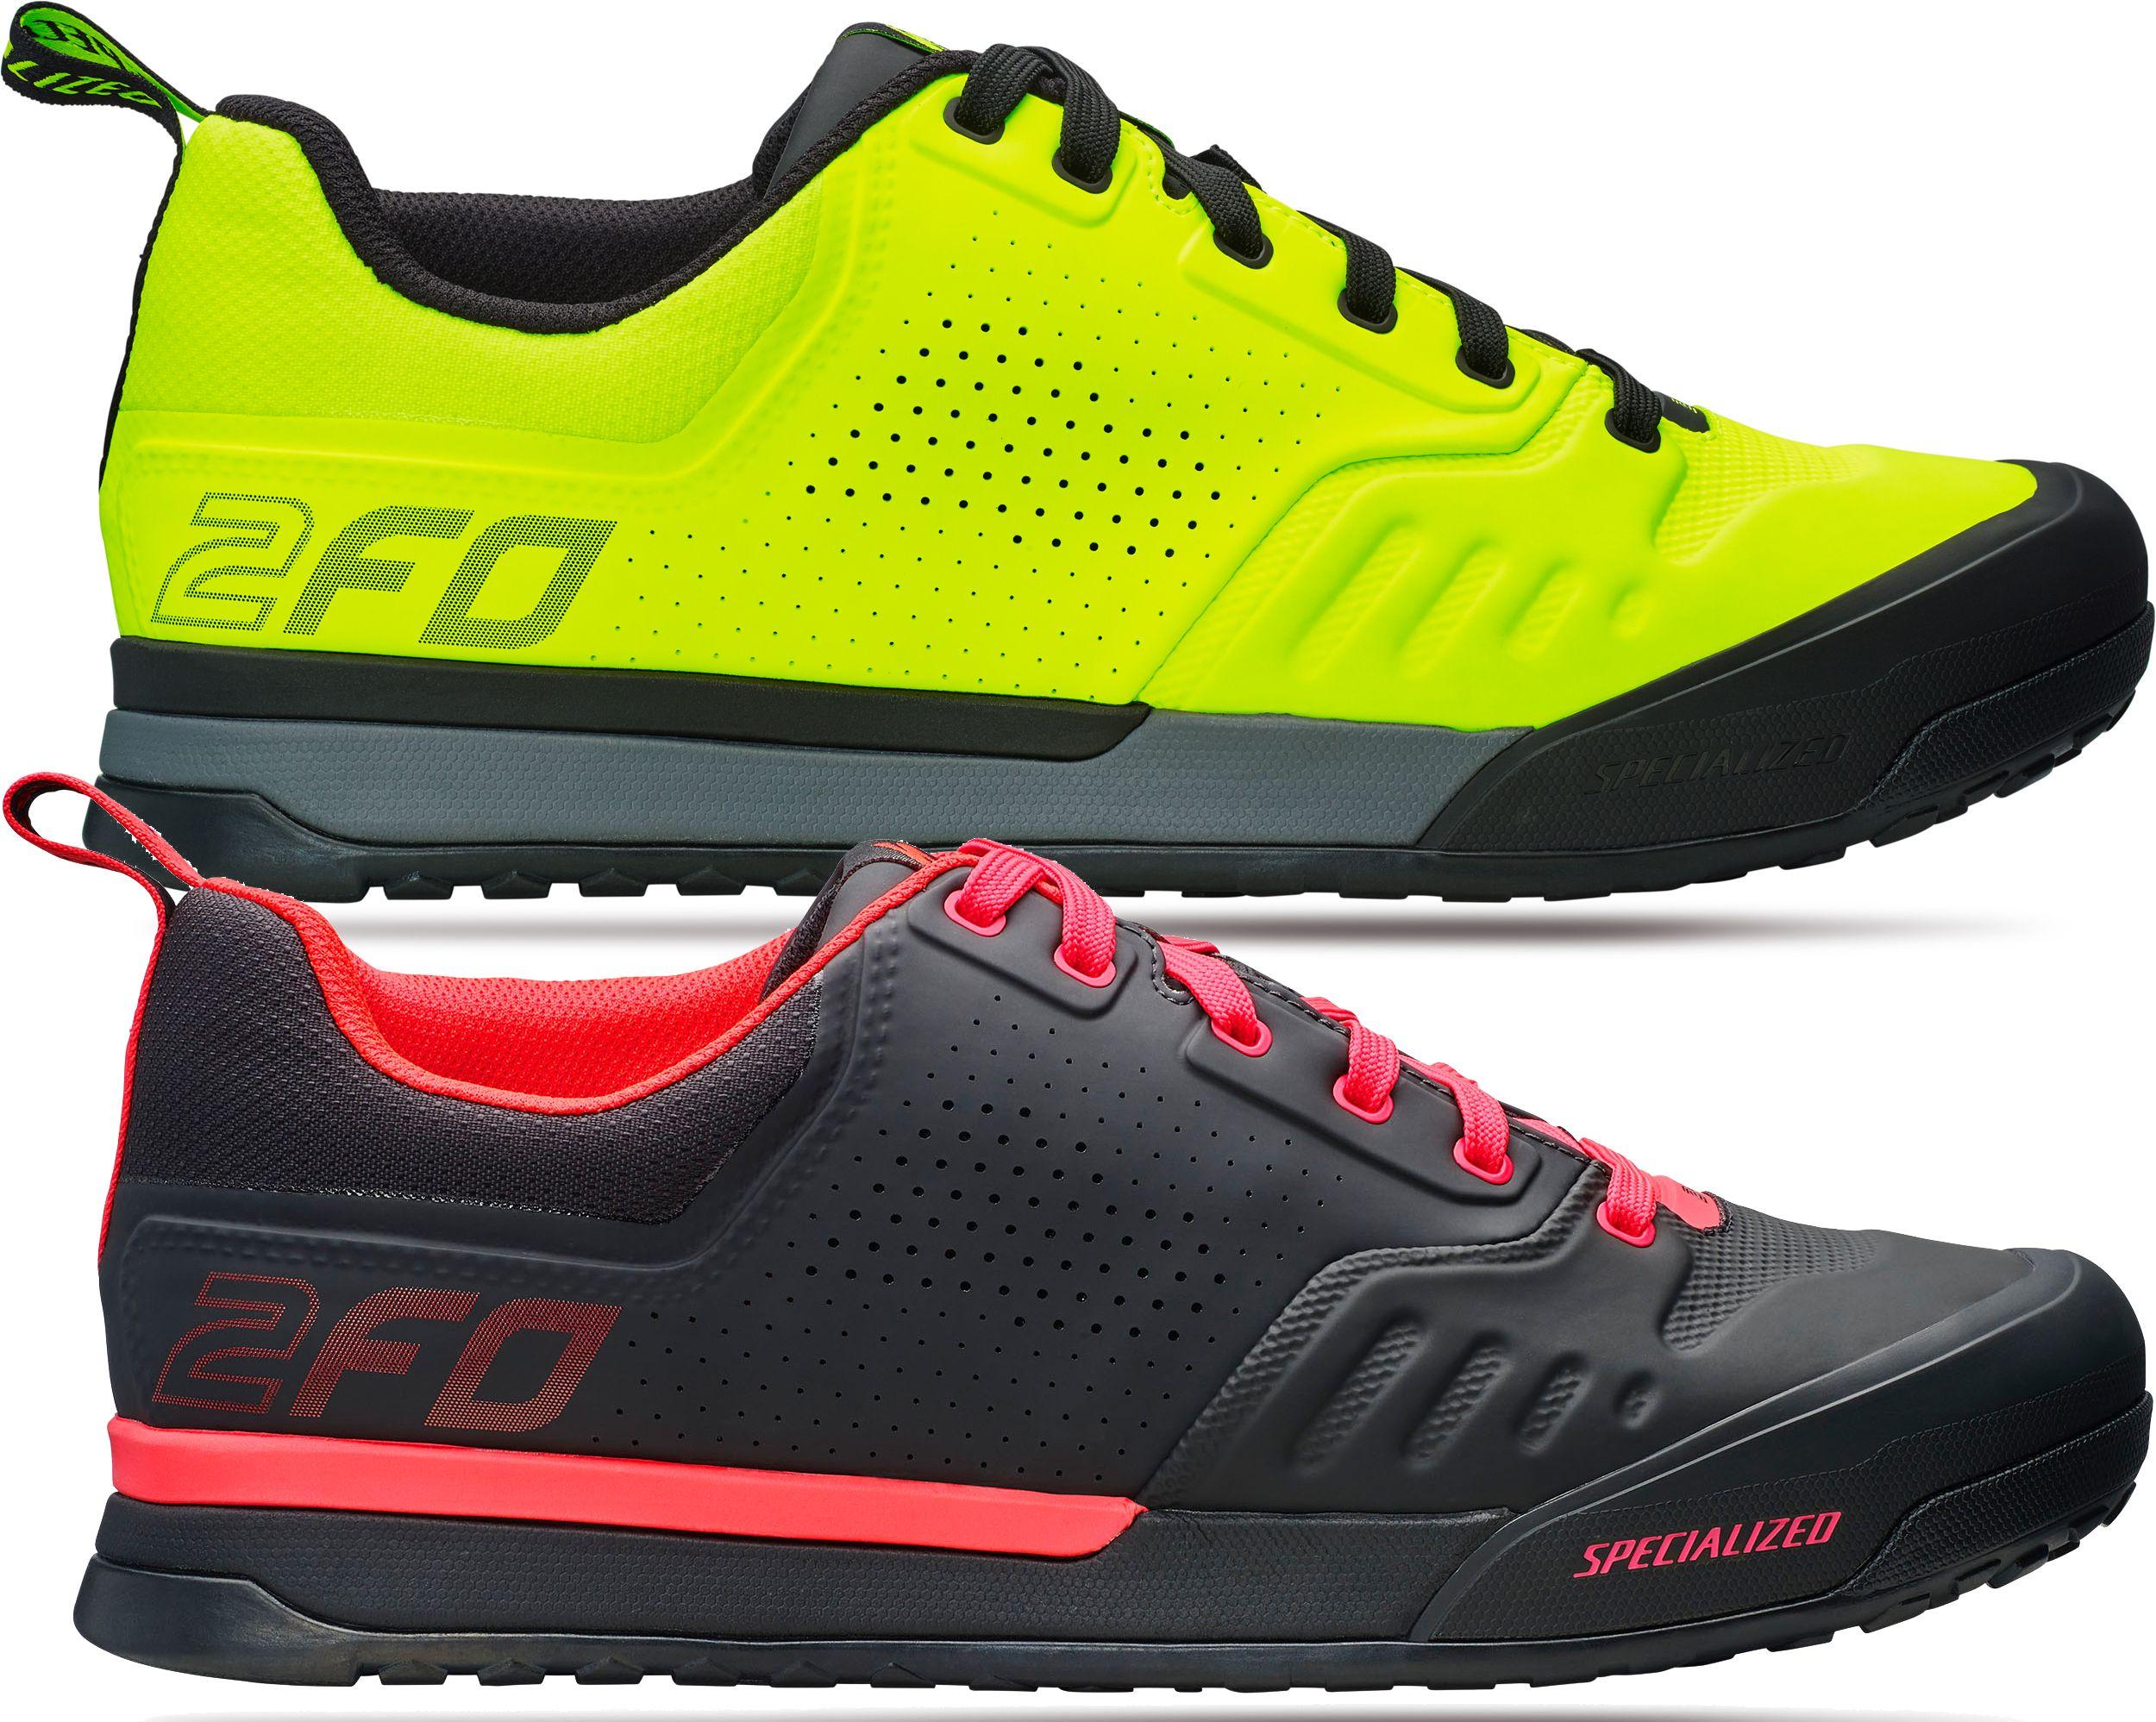 Specialized 2fo Flat 2.0 Mountain Bike Shoes | Sko